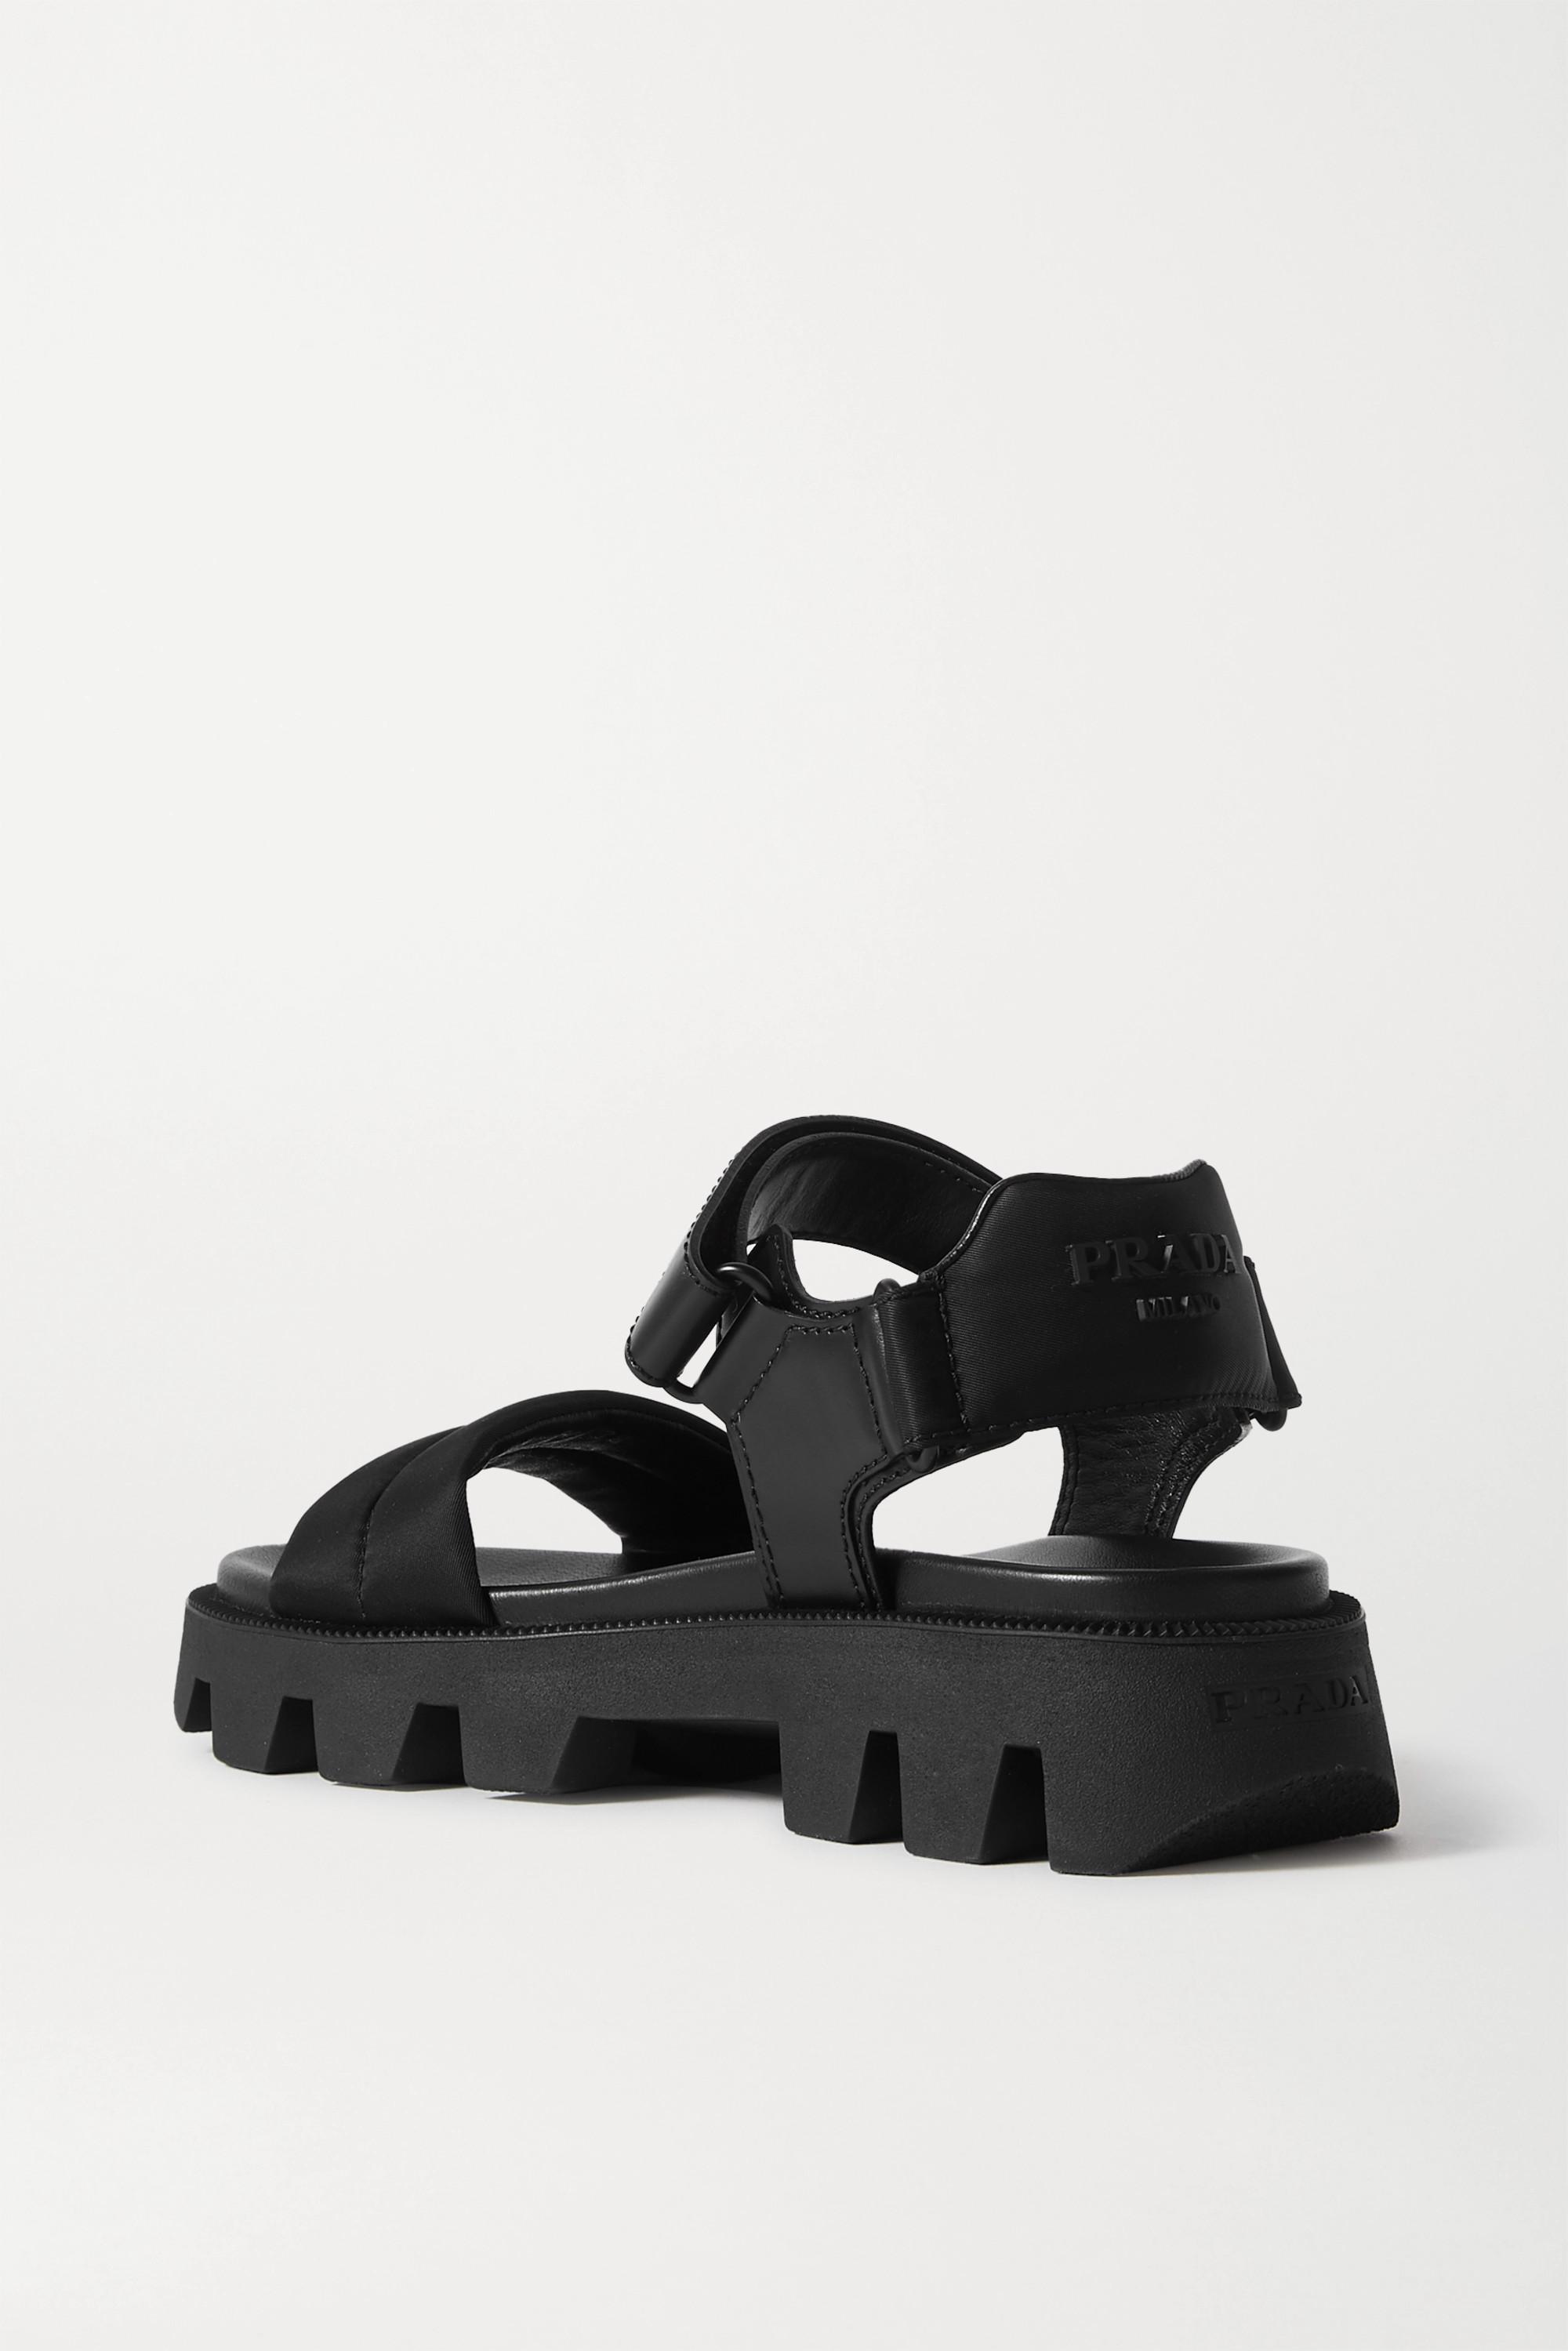 Prada Leather and nylon sandals